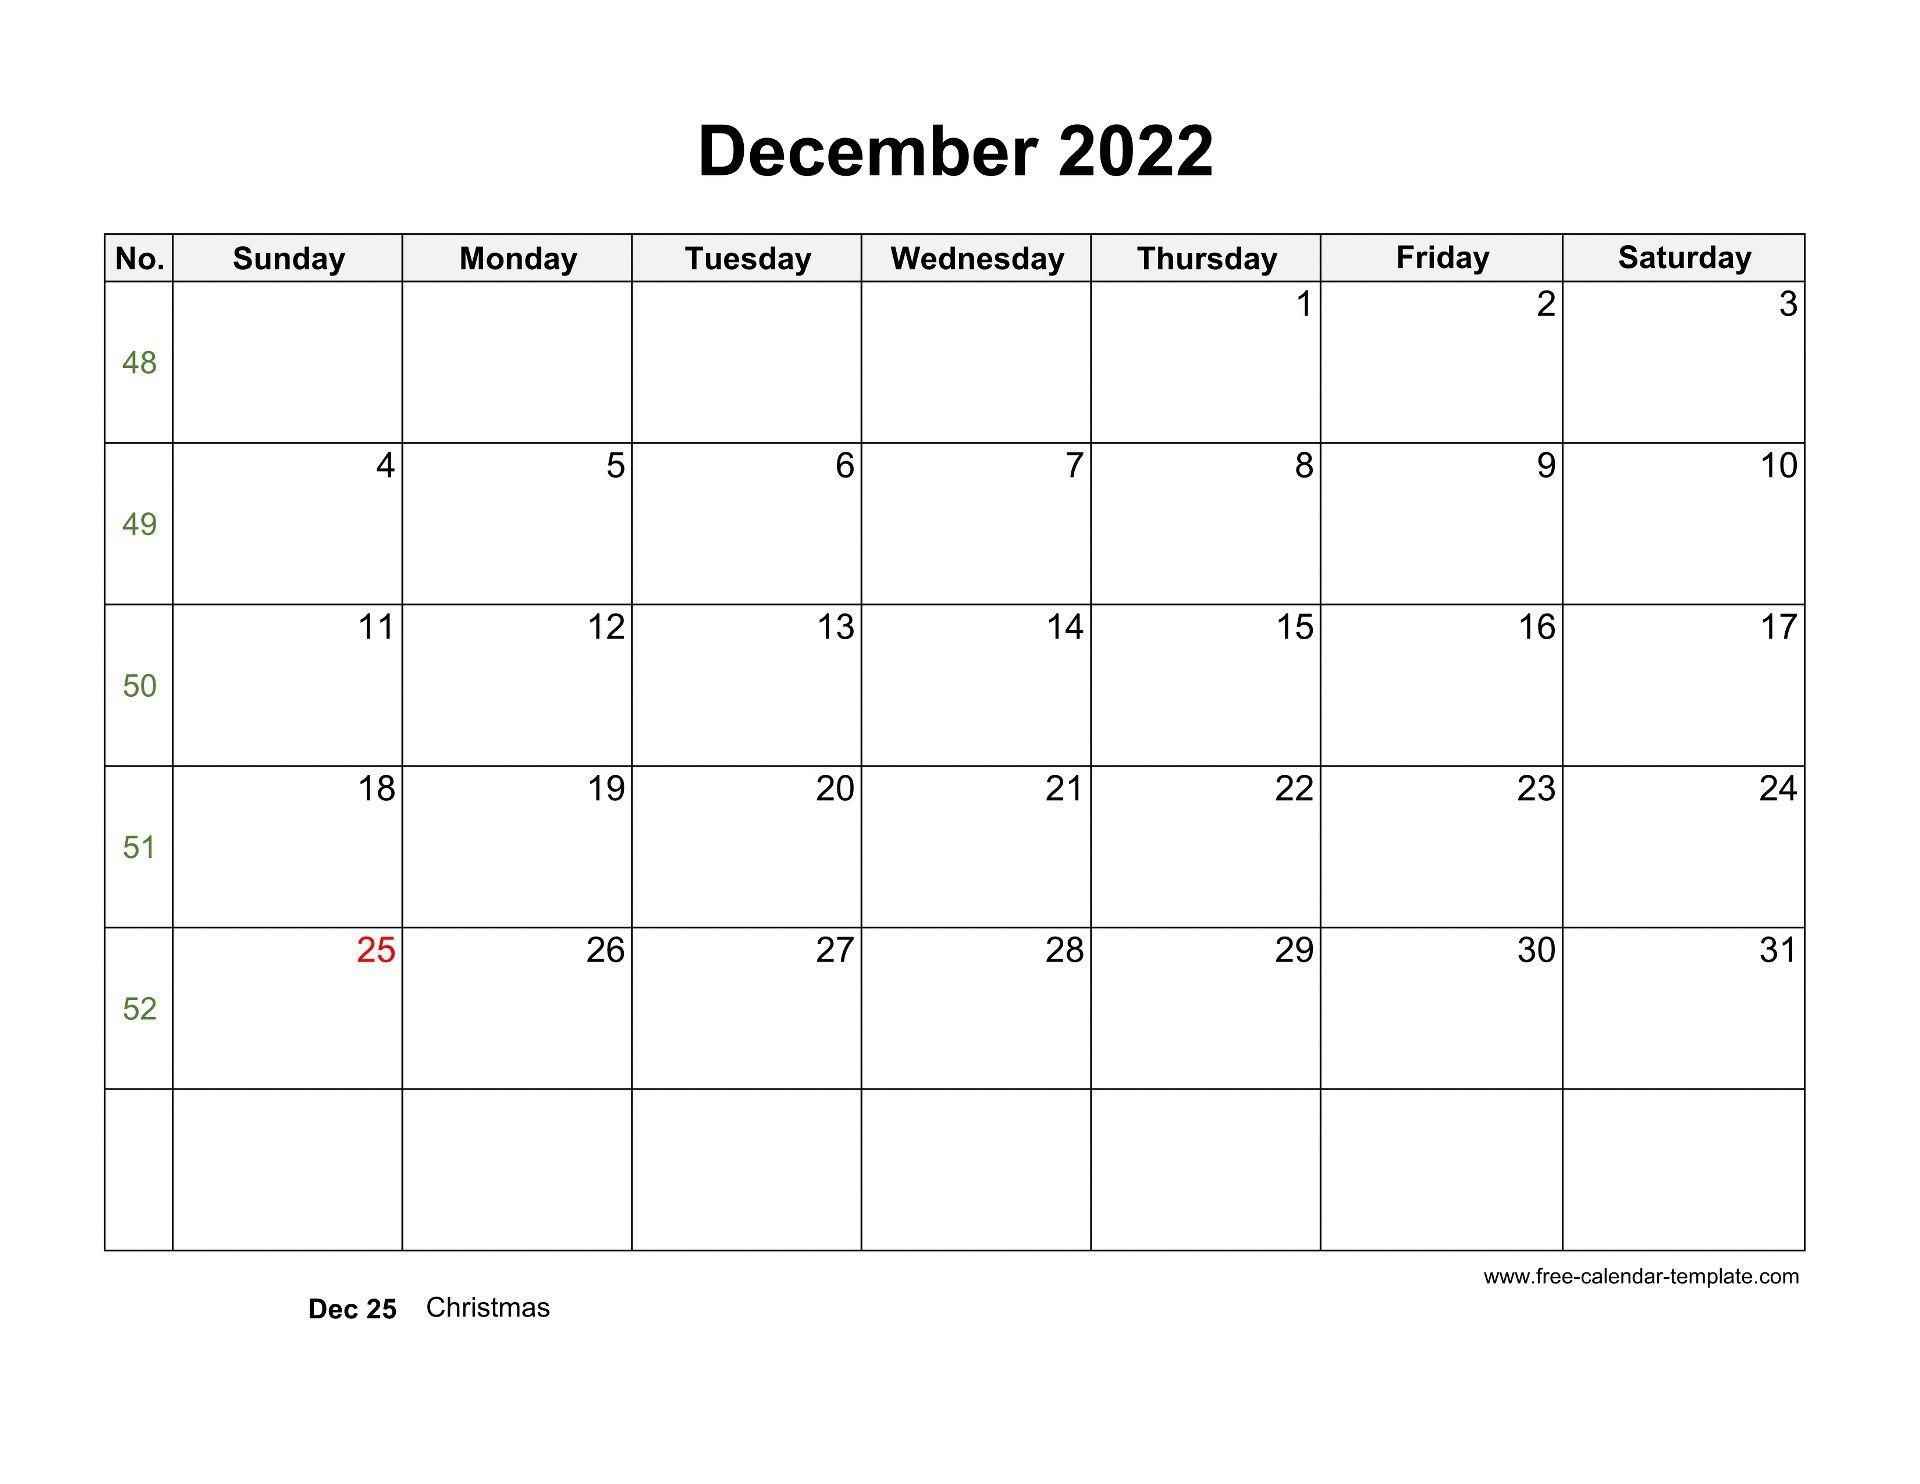 Free Printable December 2022 Calendar.Free 2022 Calendar Blank December Template Horizontal Free Calendar Template Com